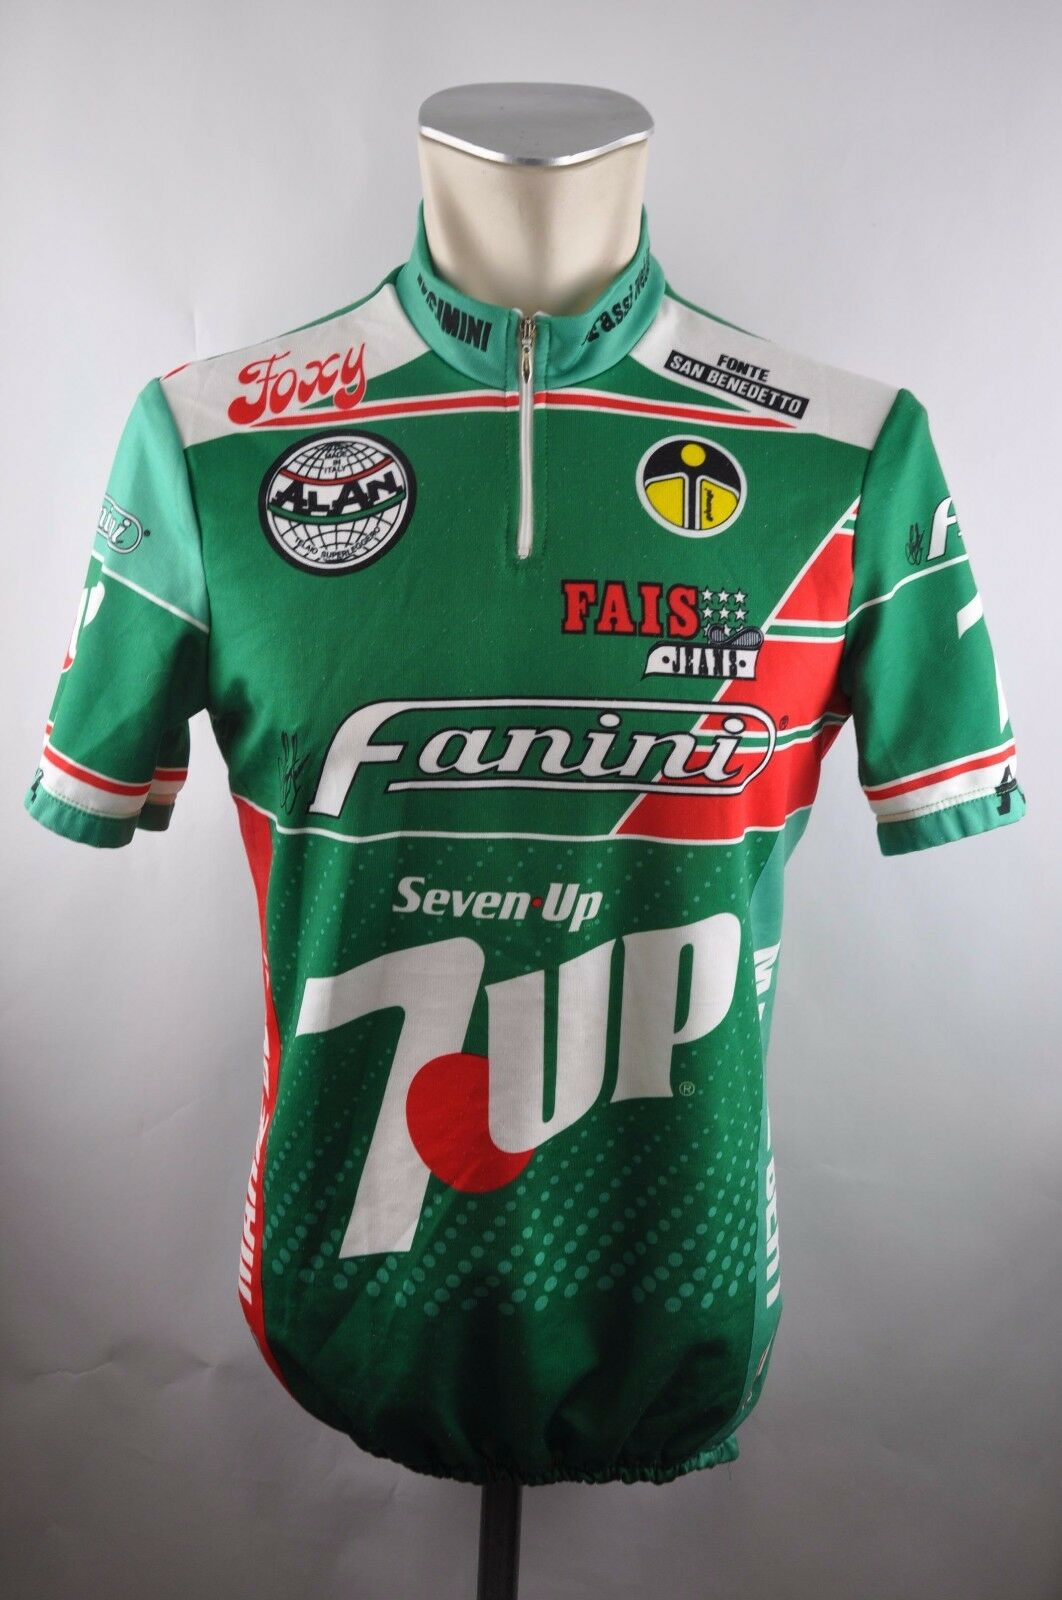 Erima  7up Seven Up GIESSEGI Fanini Cycling Jersey Bike Cycling Jersey Size 4 51cm u5  sale